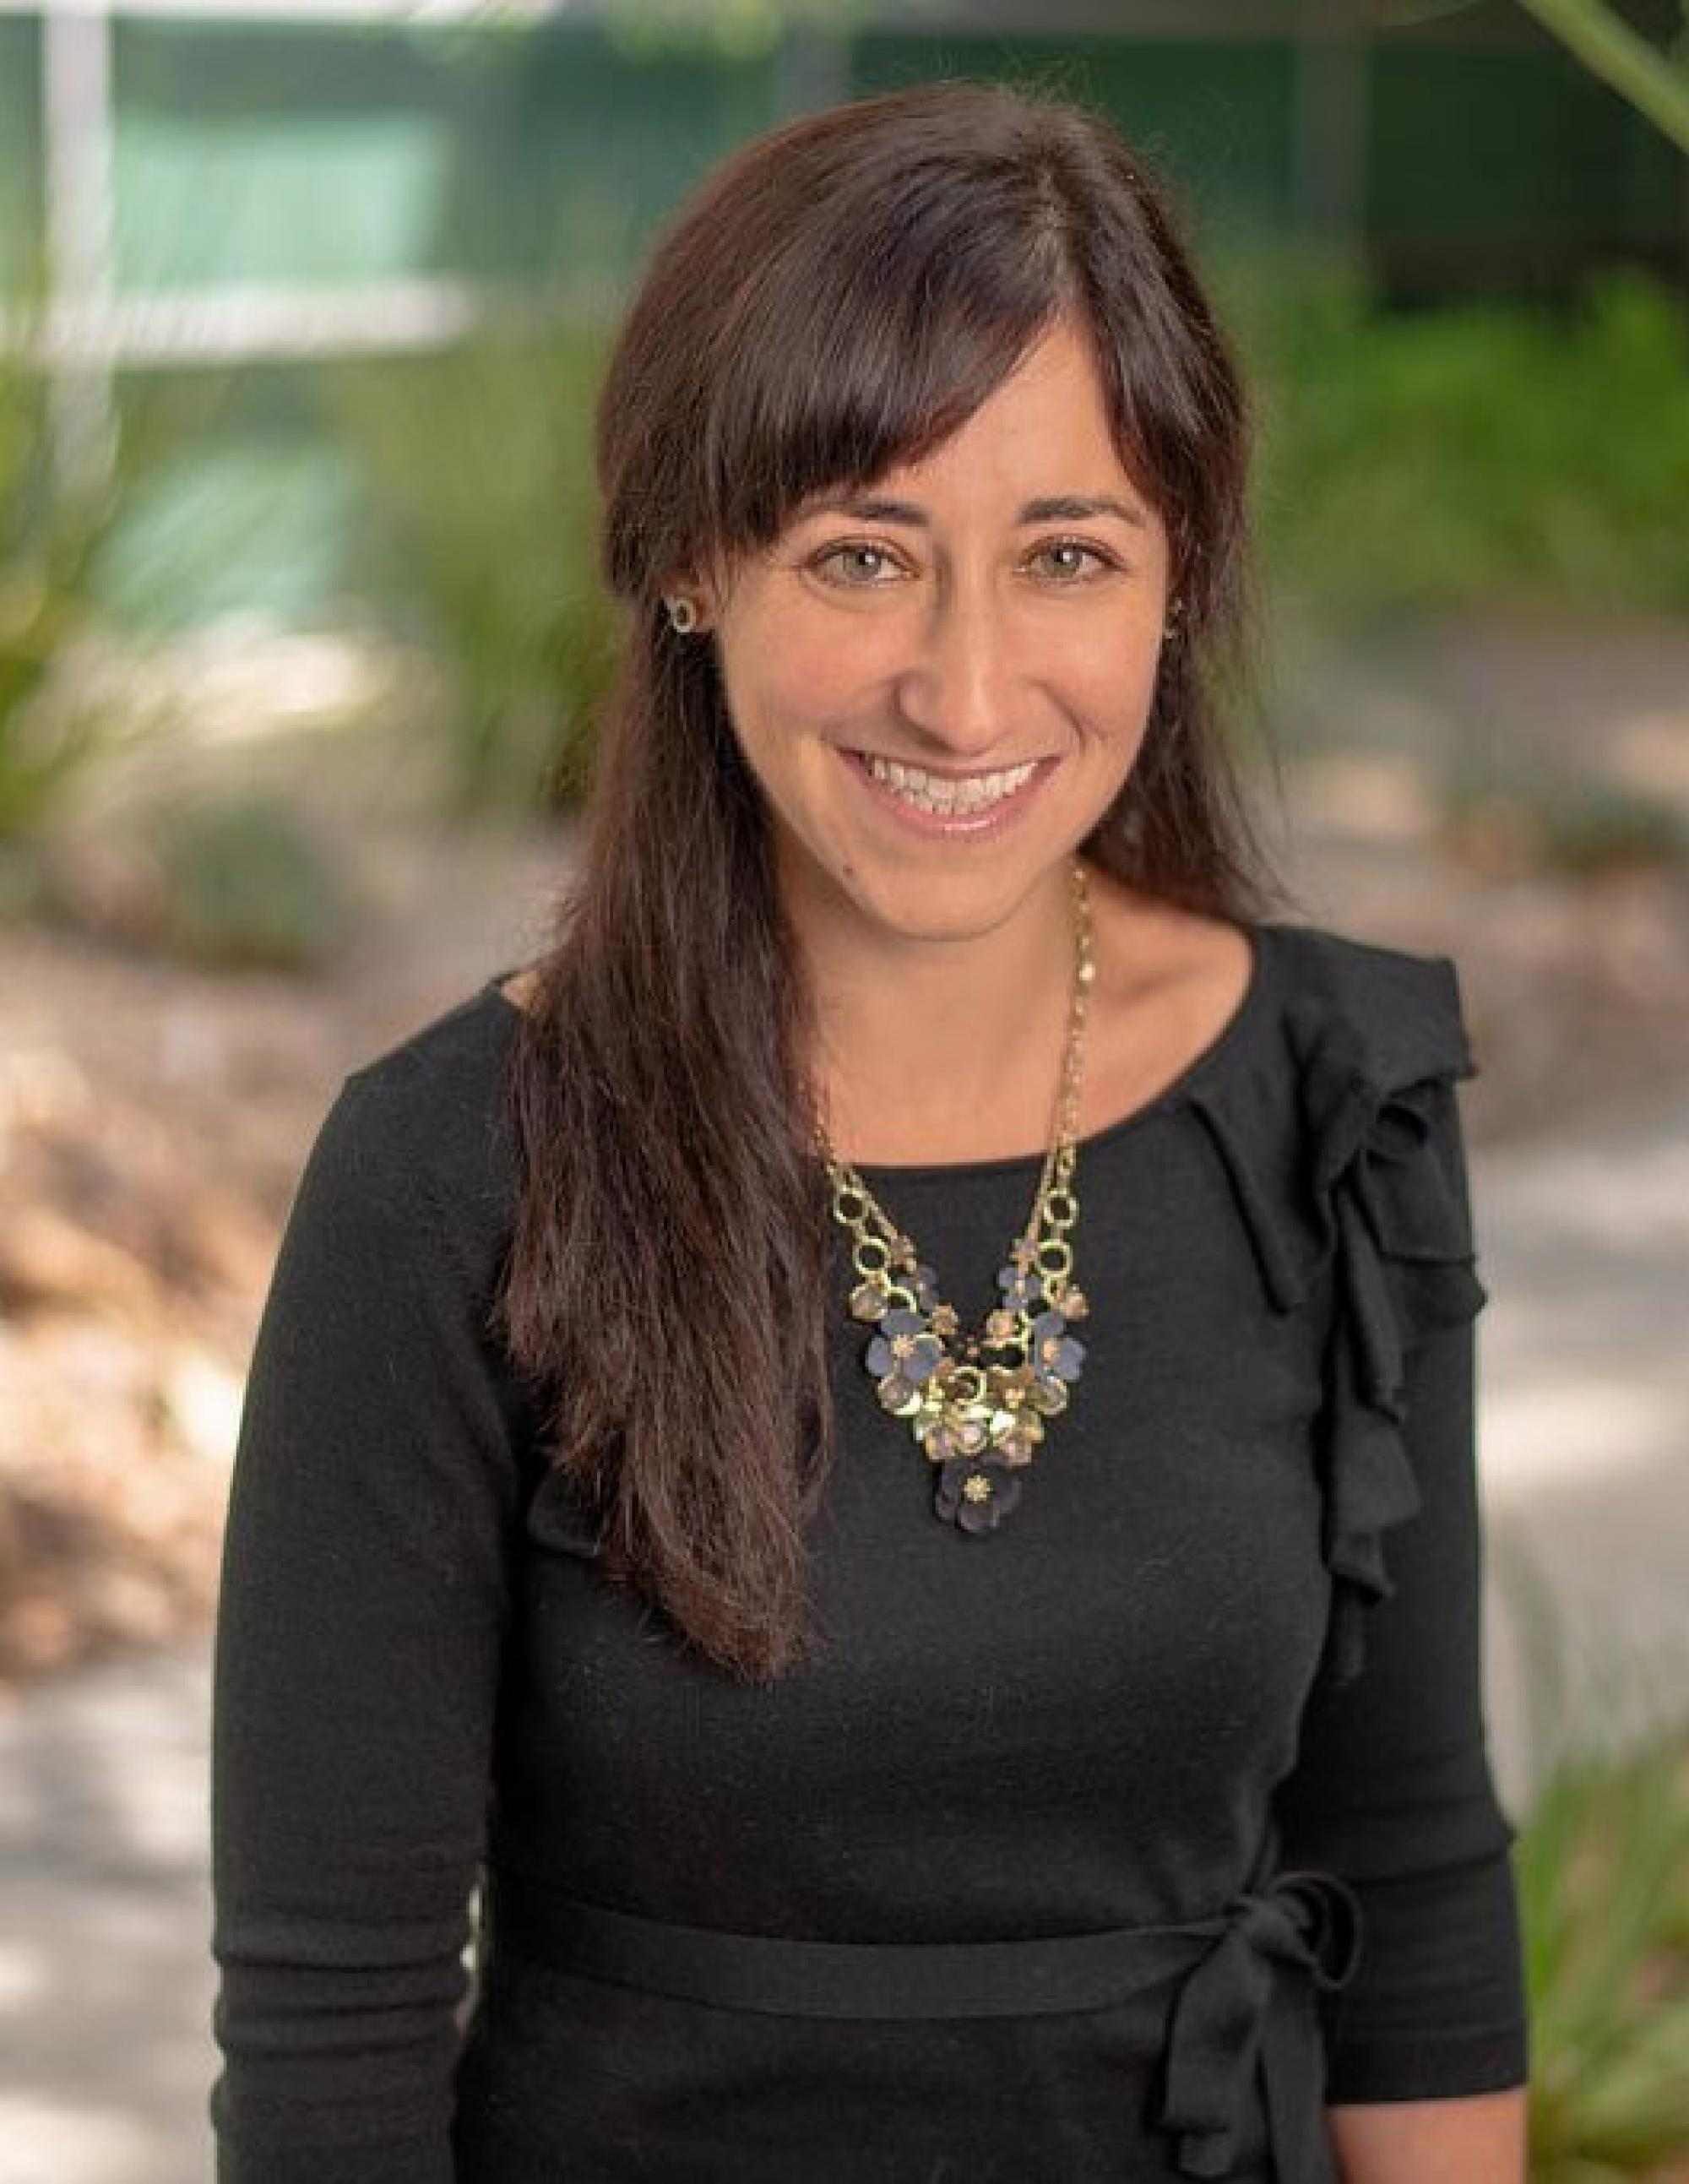 Allison Gabriel, associate professor of management and organizations